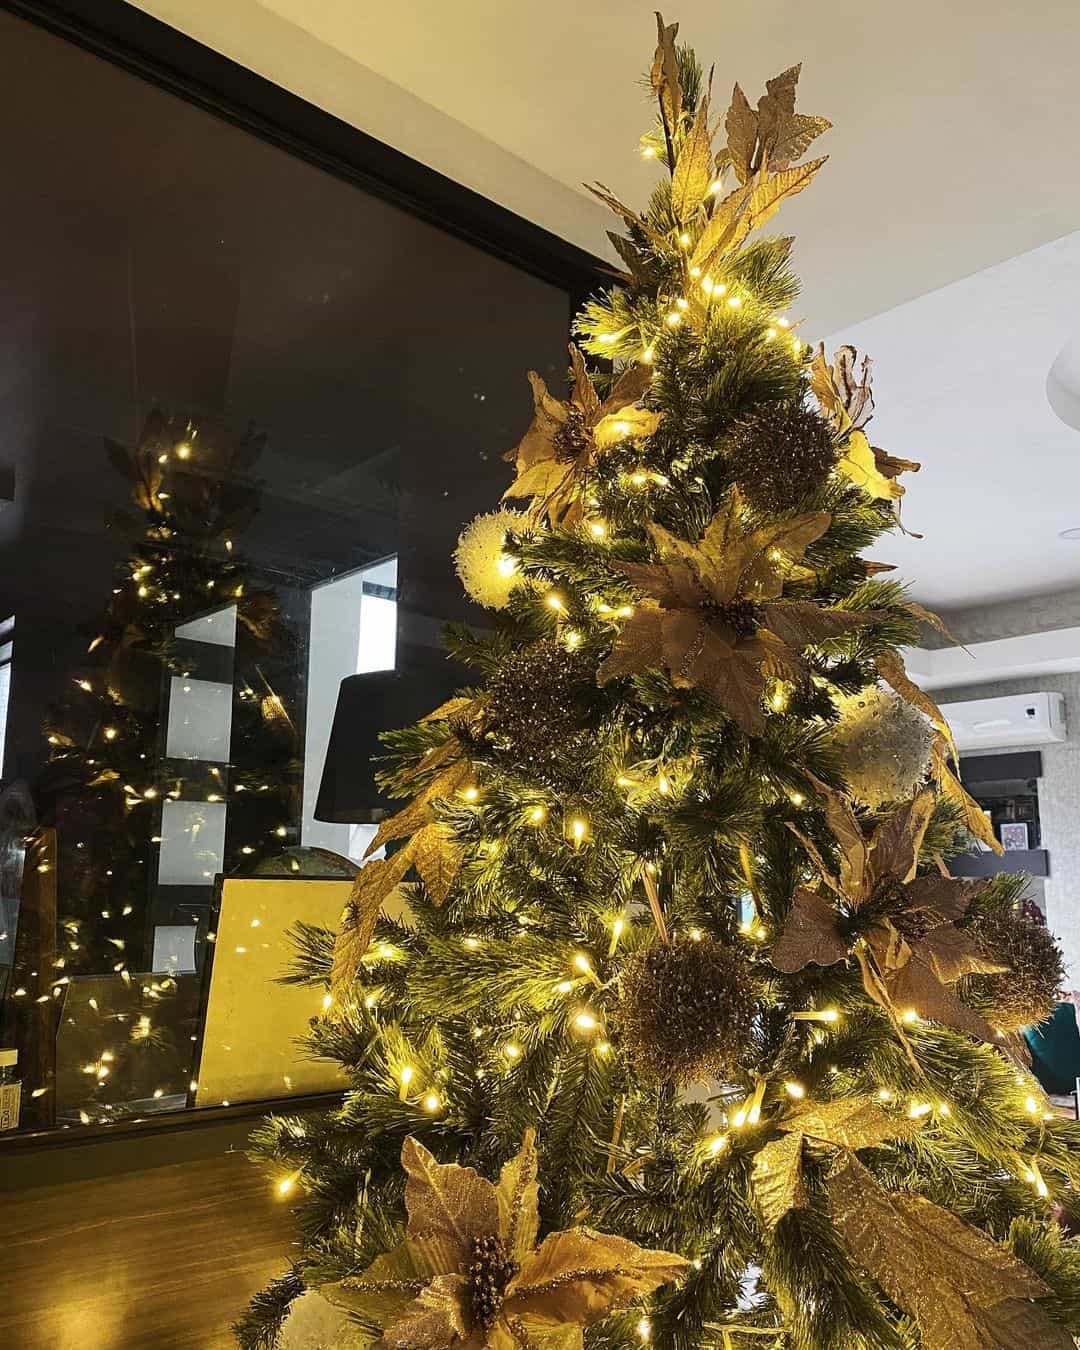 Yassi Pressman's 2020 Christmas tree